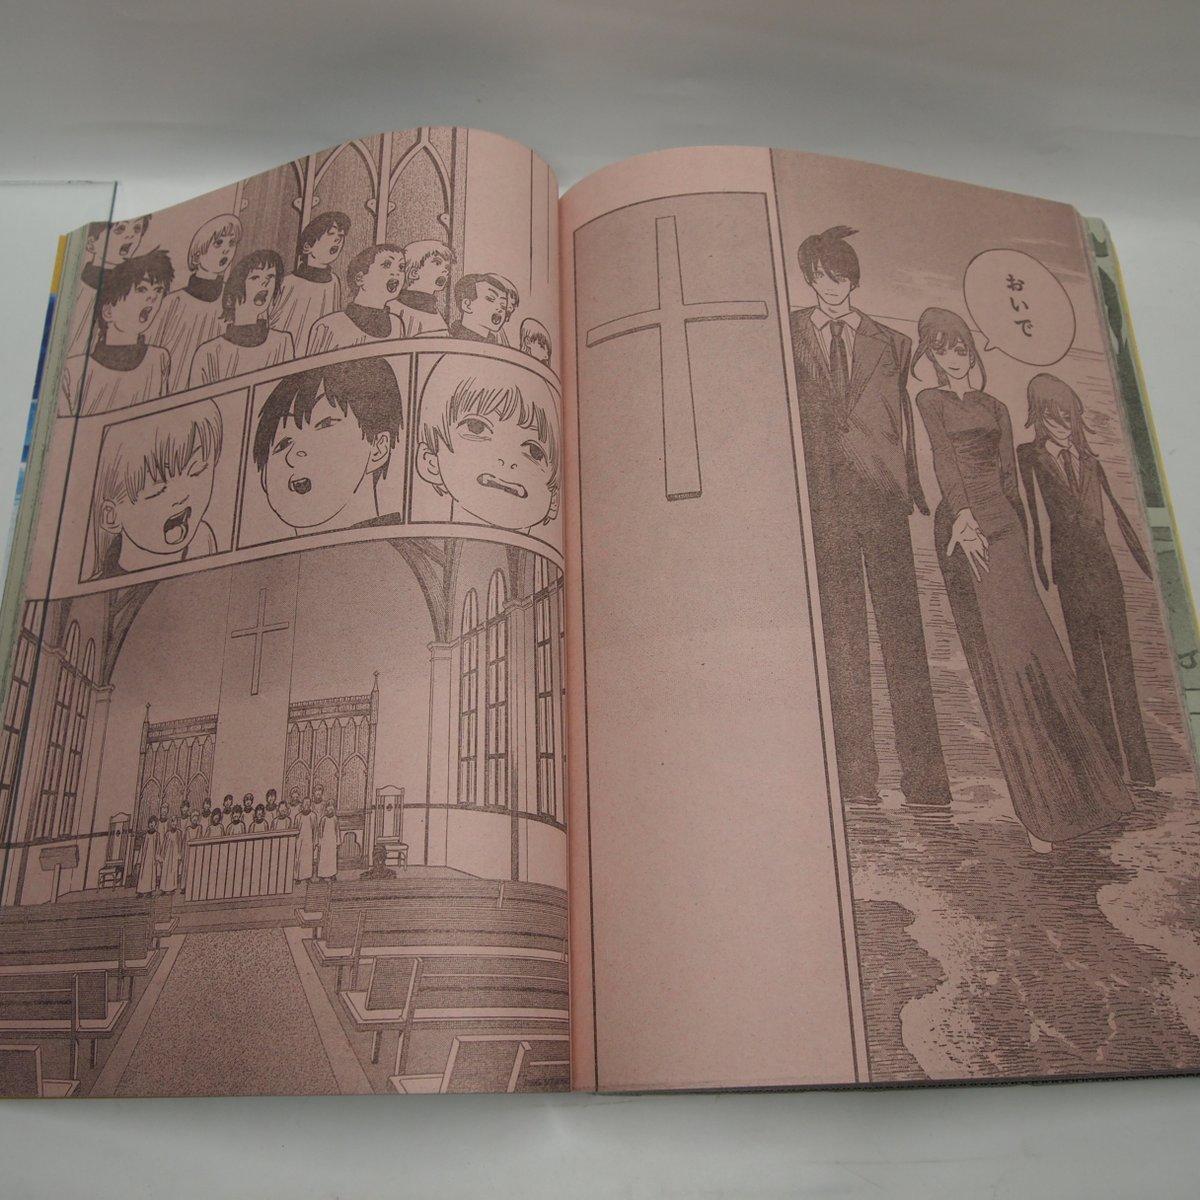 Check out Weekly Shonen Jump 2020 No.30 Anime Japan manga Magazine Comic Figure Goods Art  via @eBay #chainsawman #チェンソーマン #chainsawmanmanga #denji #makima #WeeklyShonenJump #Anime #manga #followforfollowback #followback100 #f4f #likeforlike #l4l